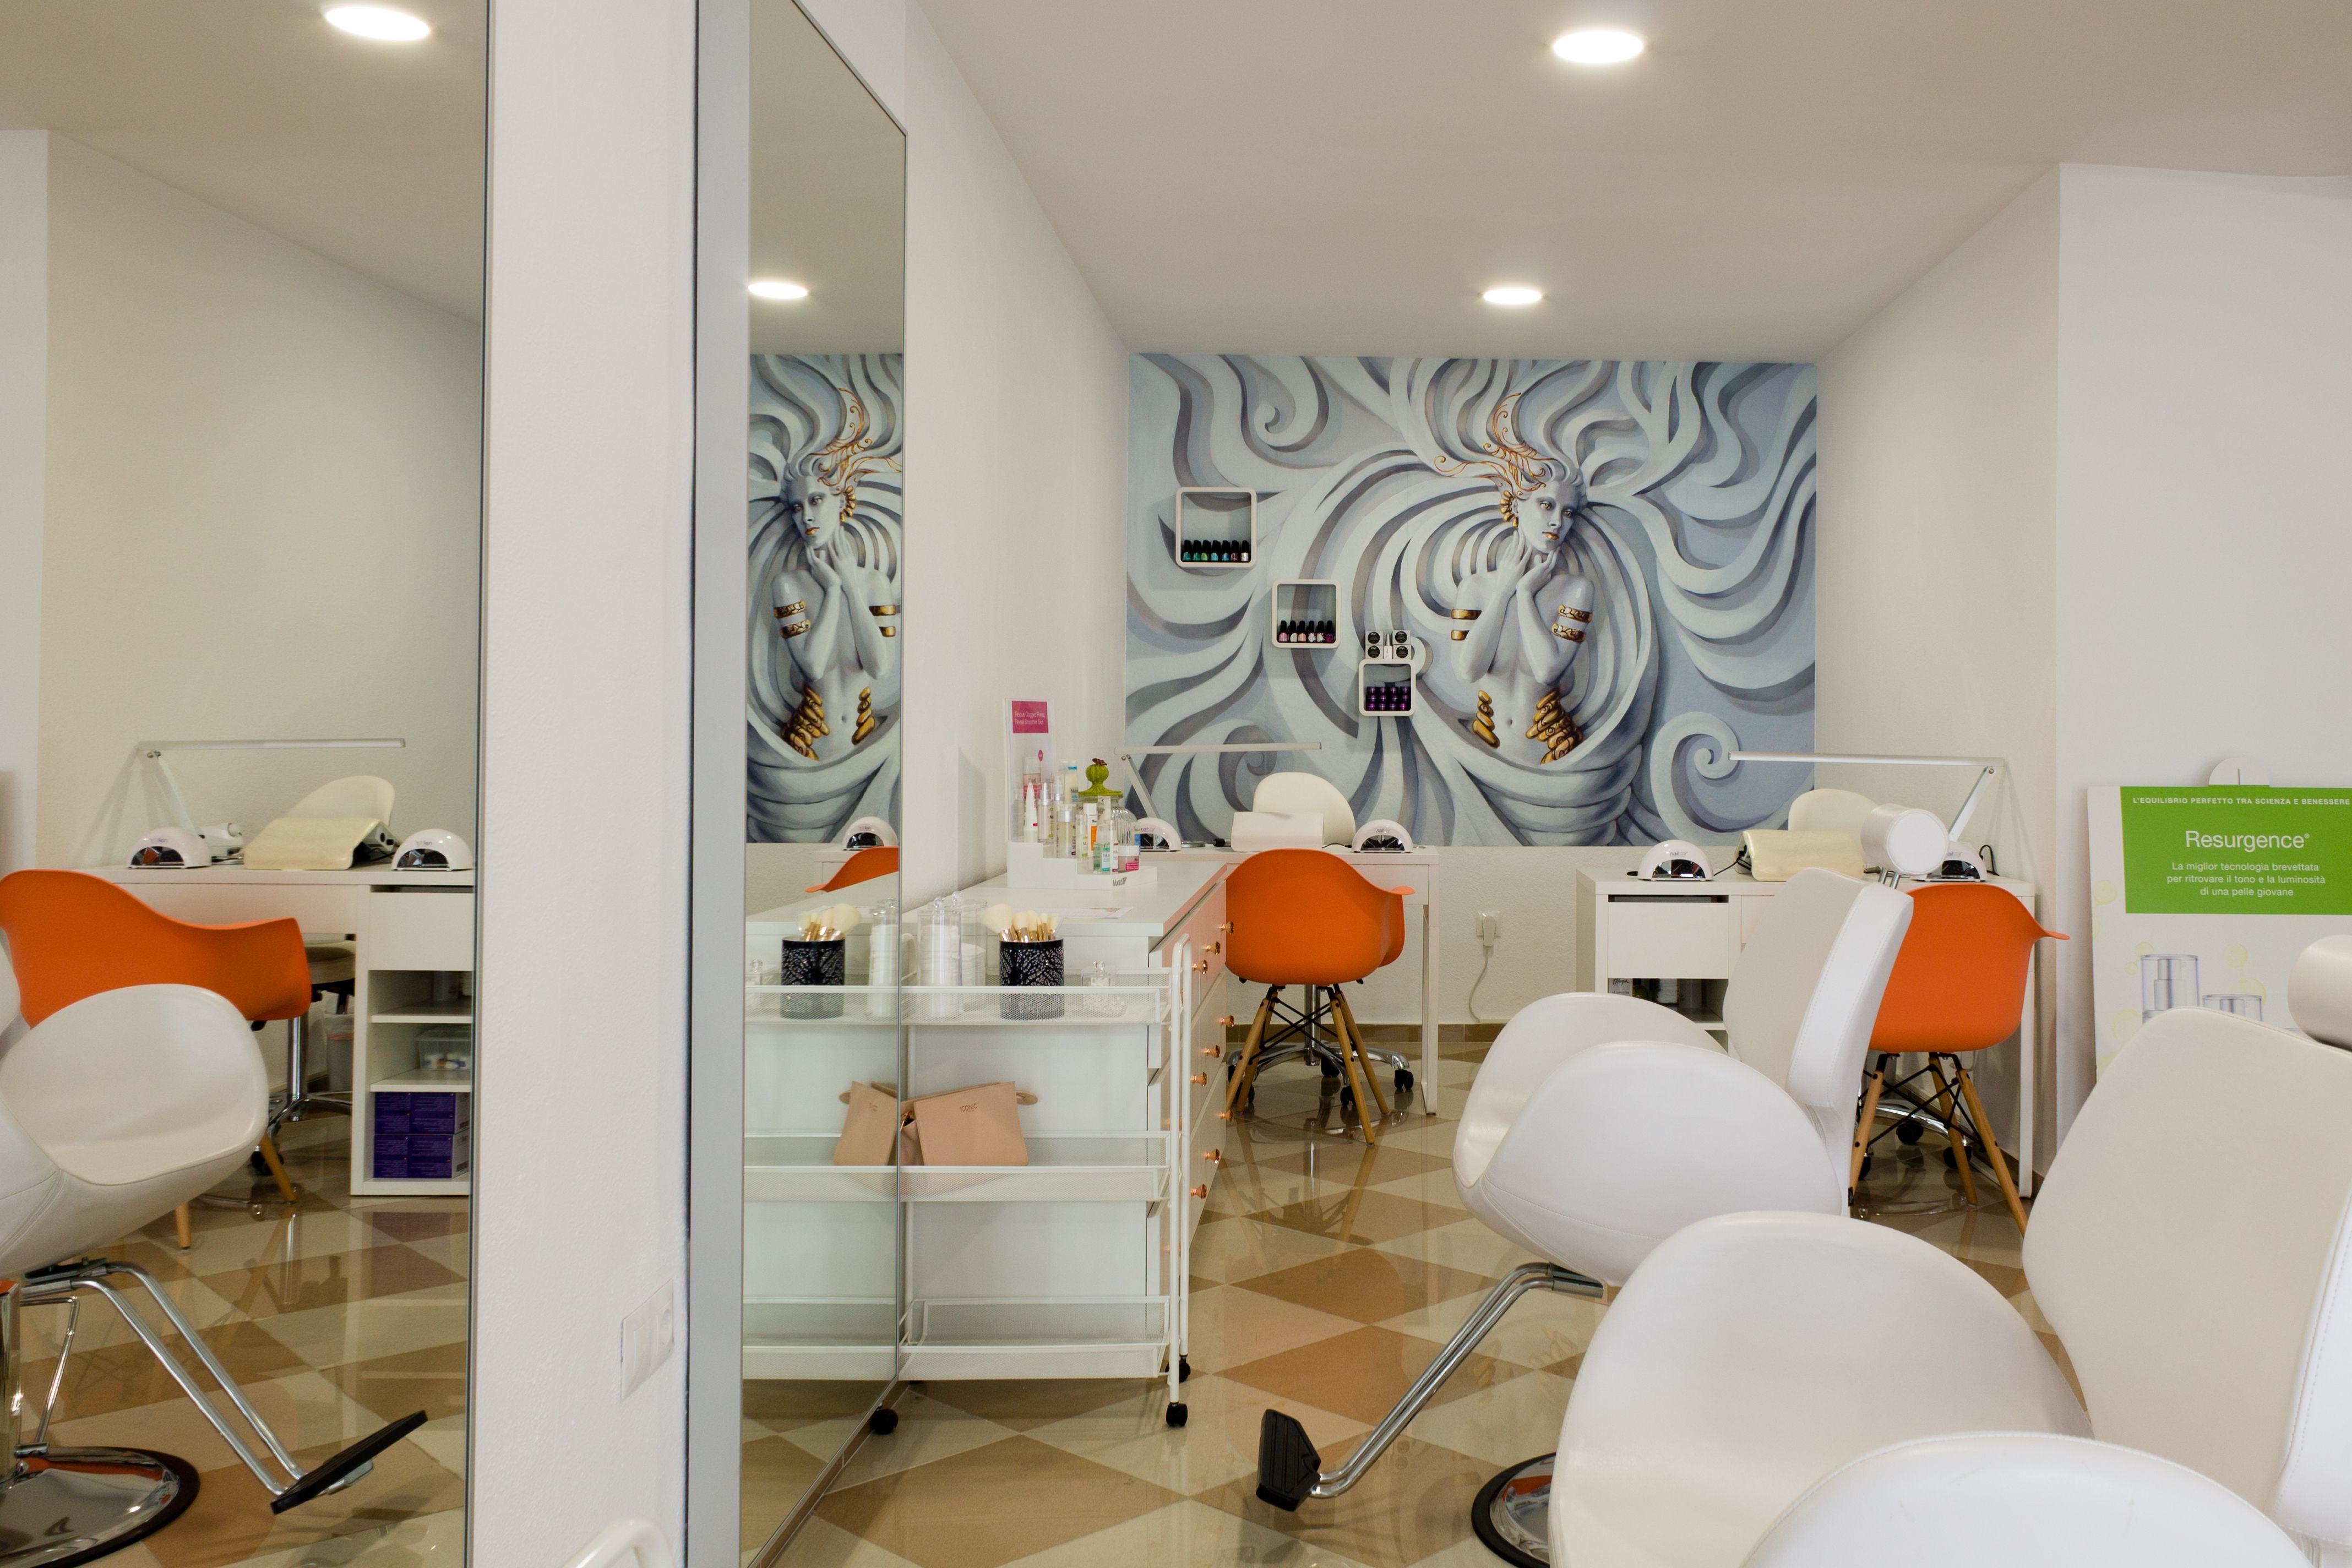 Centro de estética en Marbella